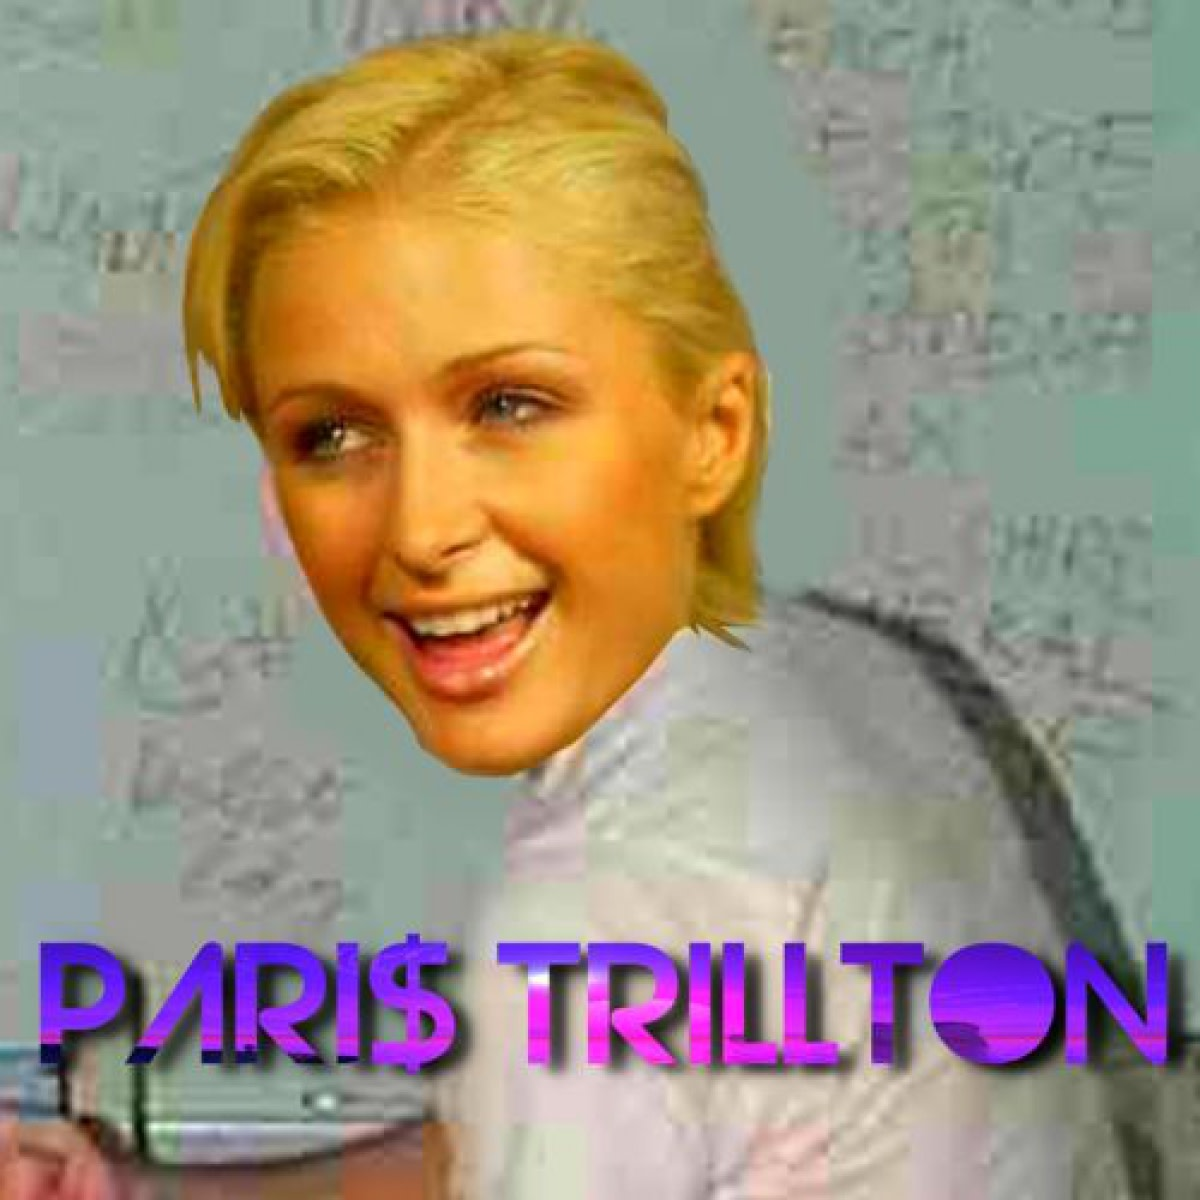 ParisTrillton